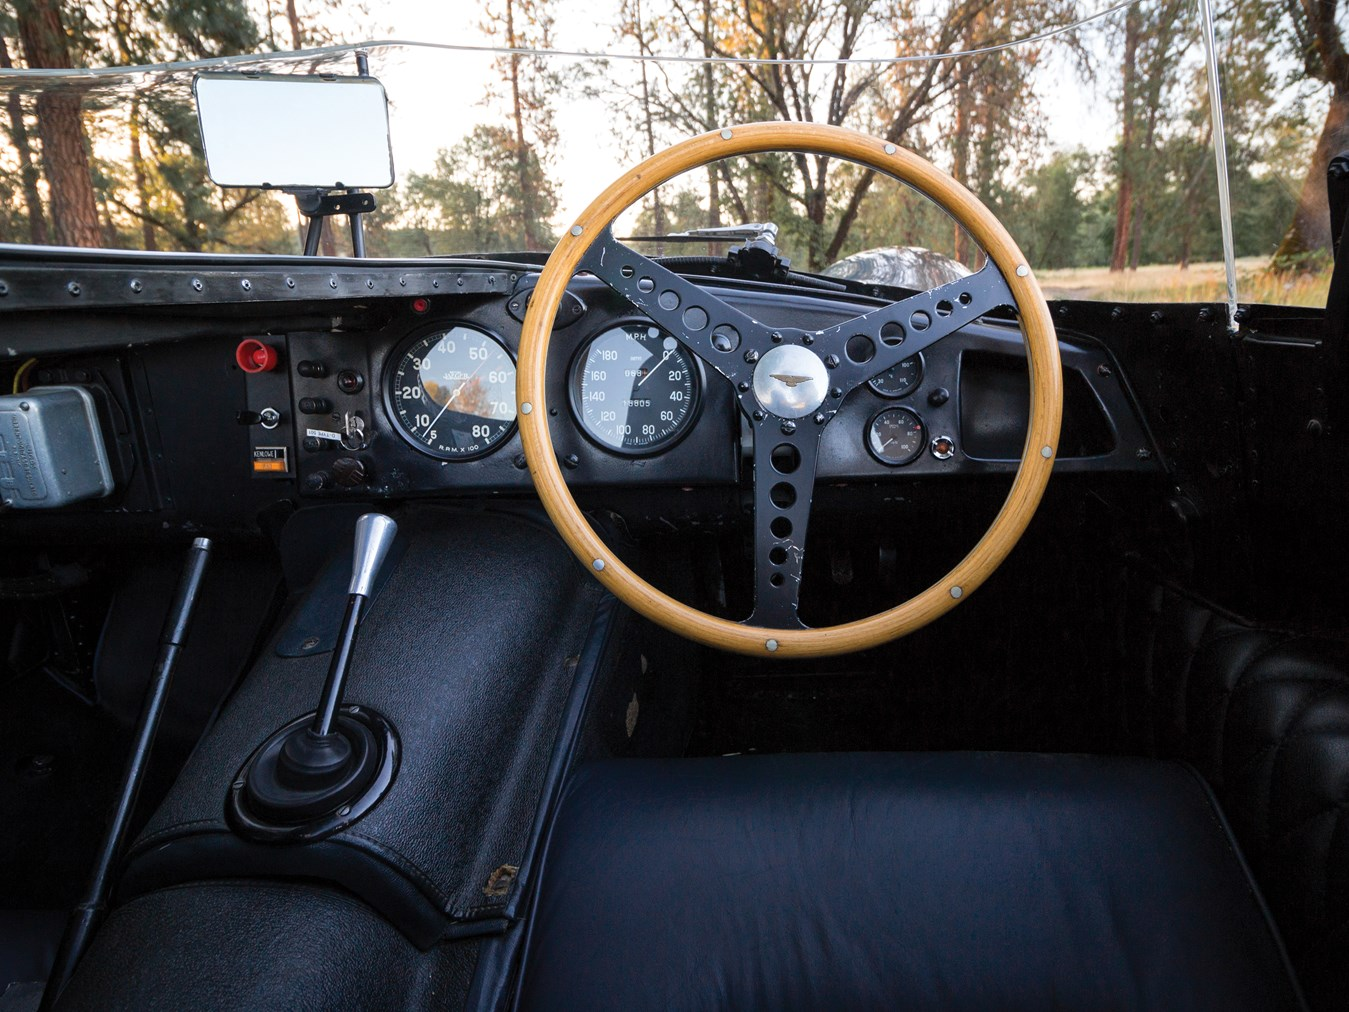 Le Mans Winning Jaguar D-Type Sets Record Price for British Cars ...